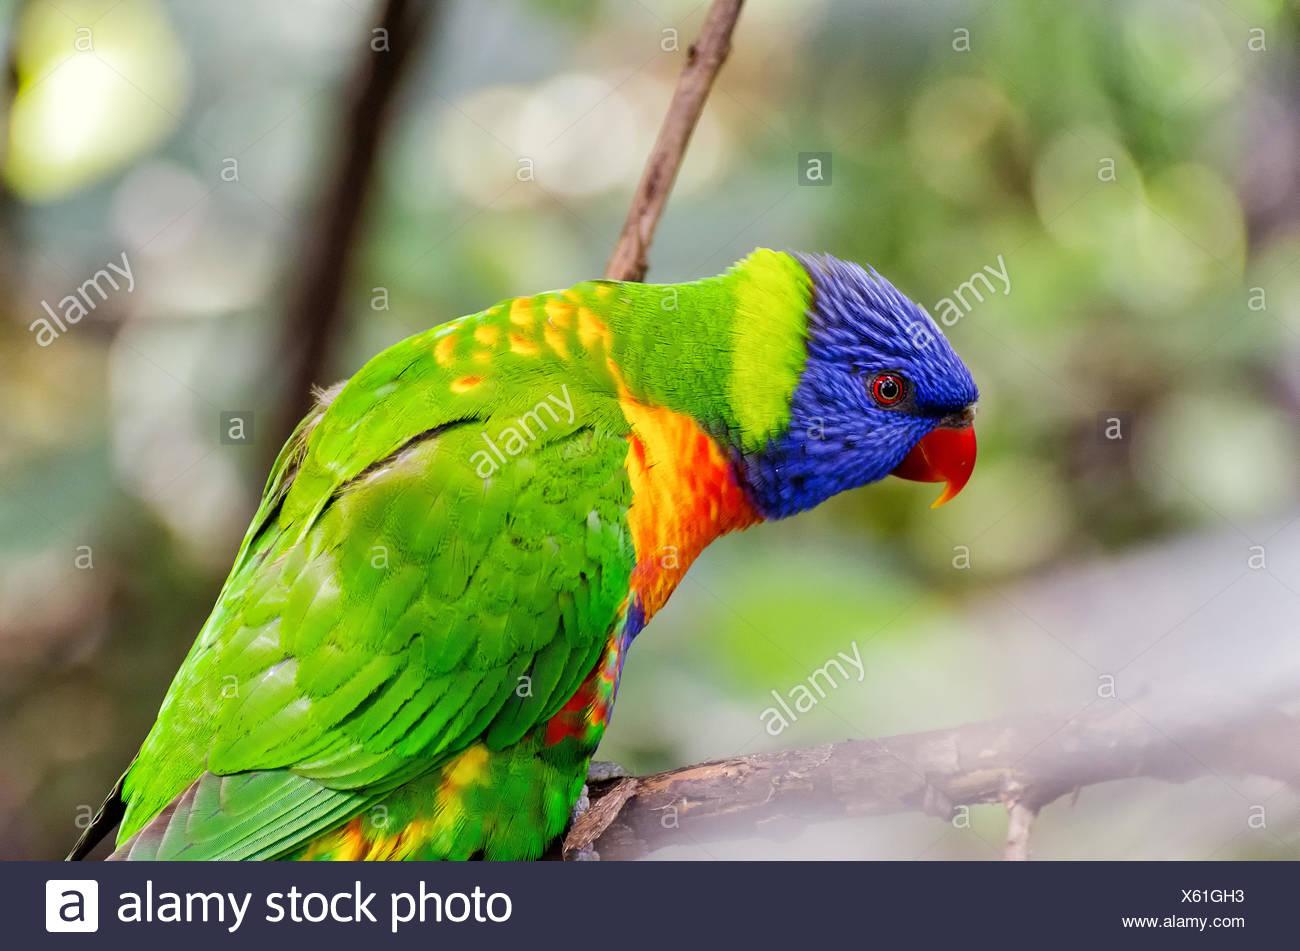 Rainbow lori - Stock Image